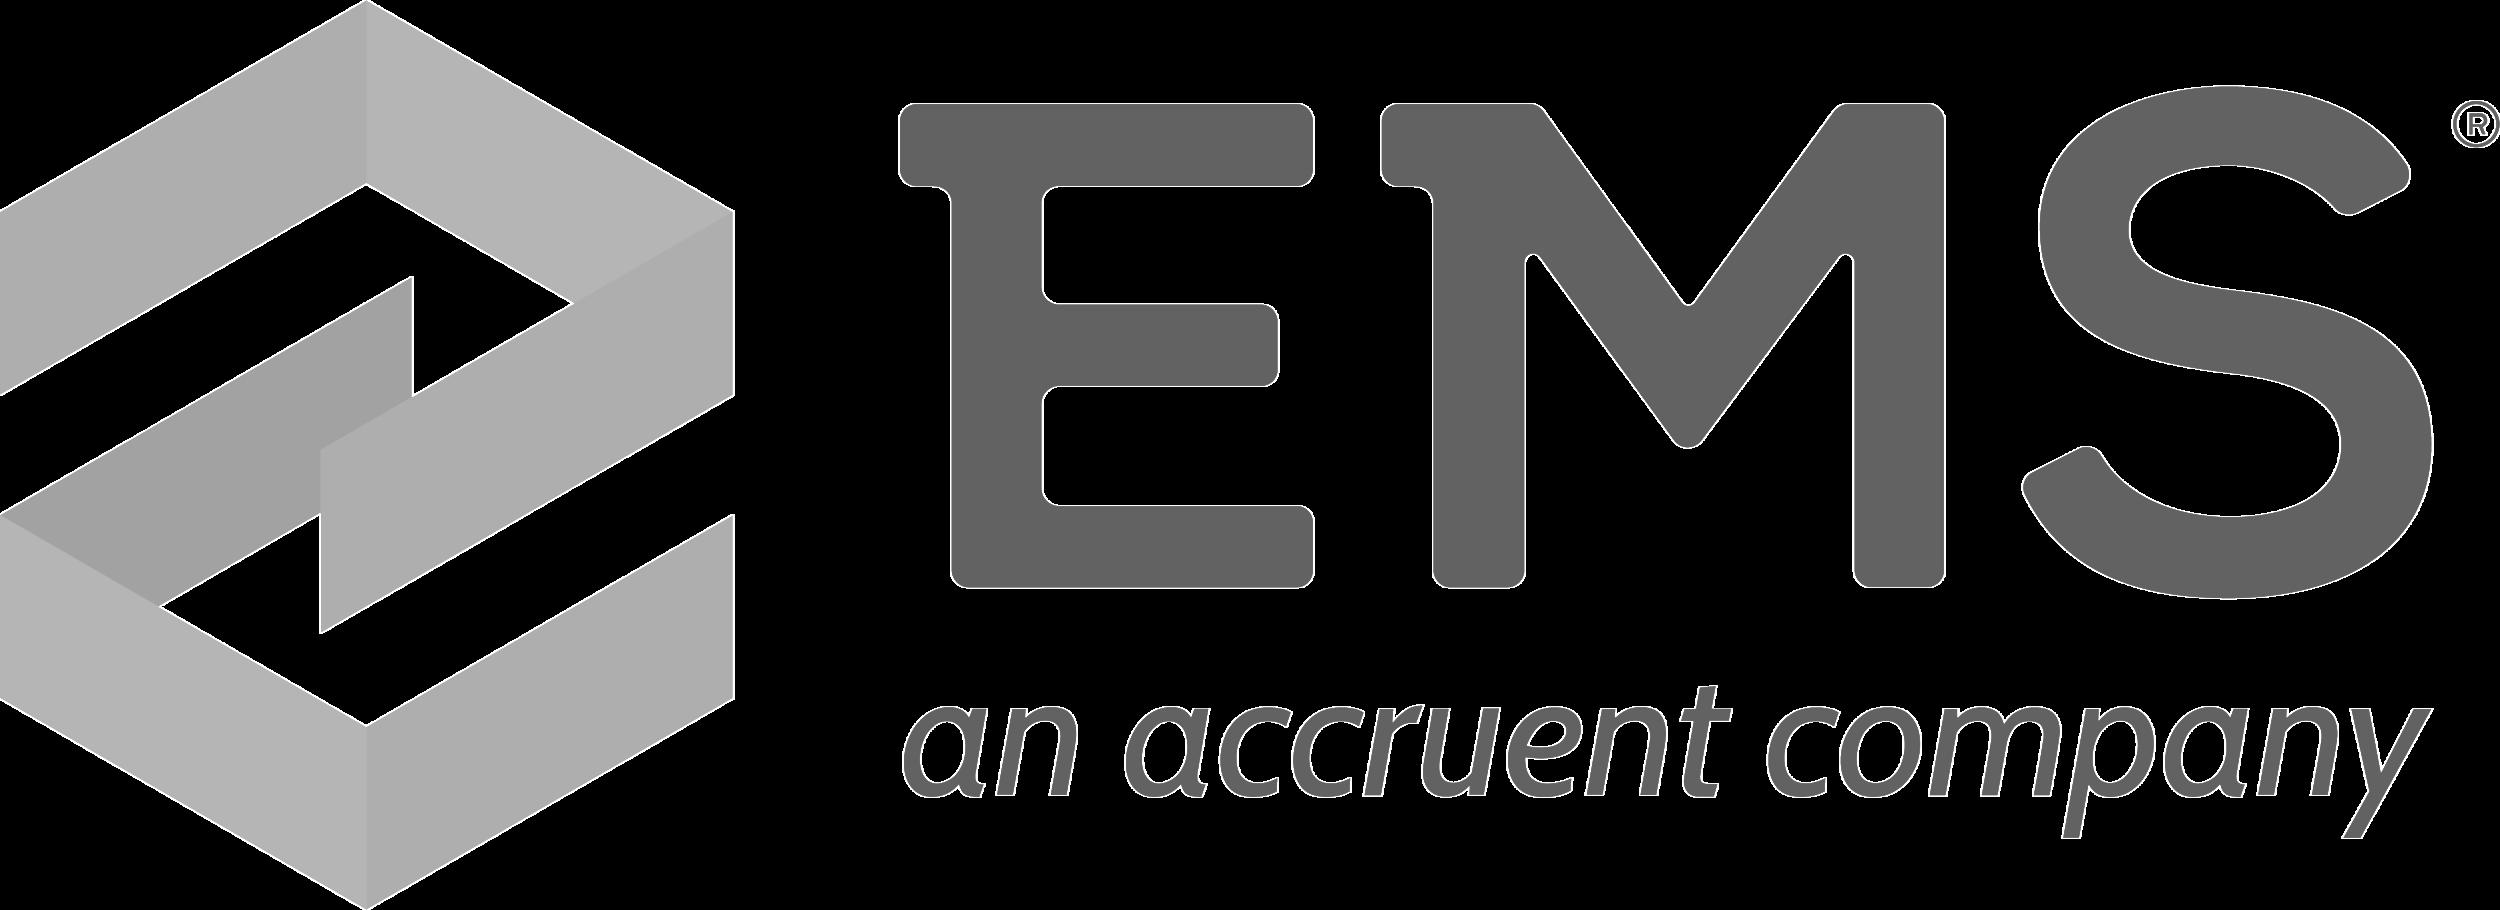 EMS_logo copy.png